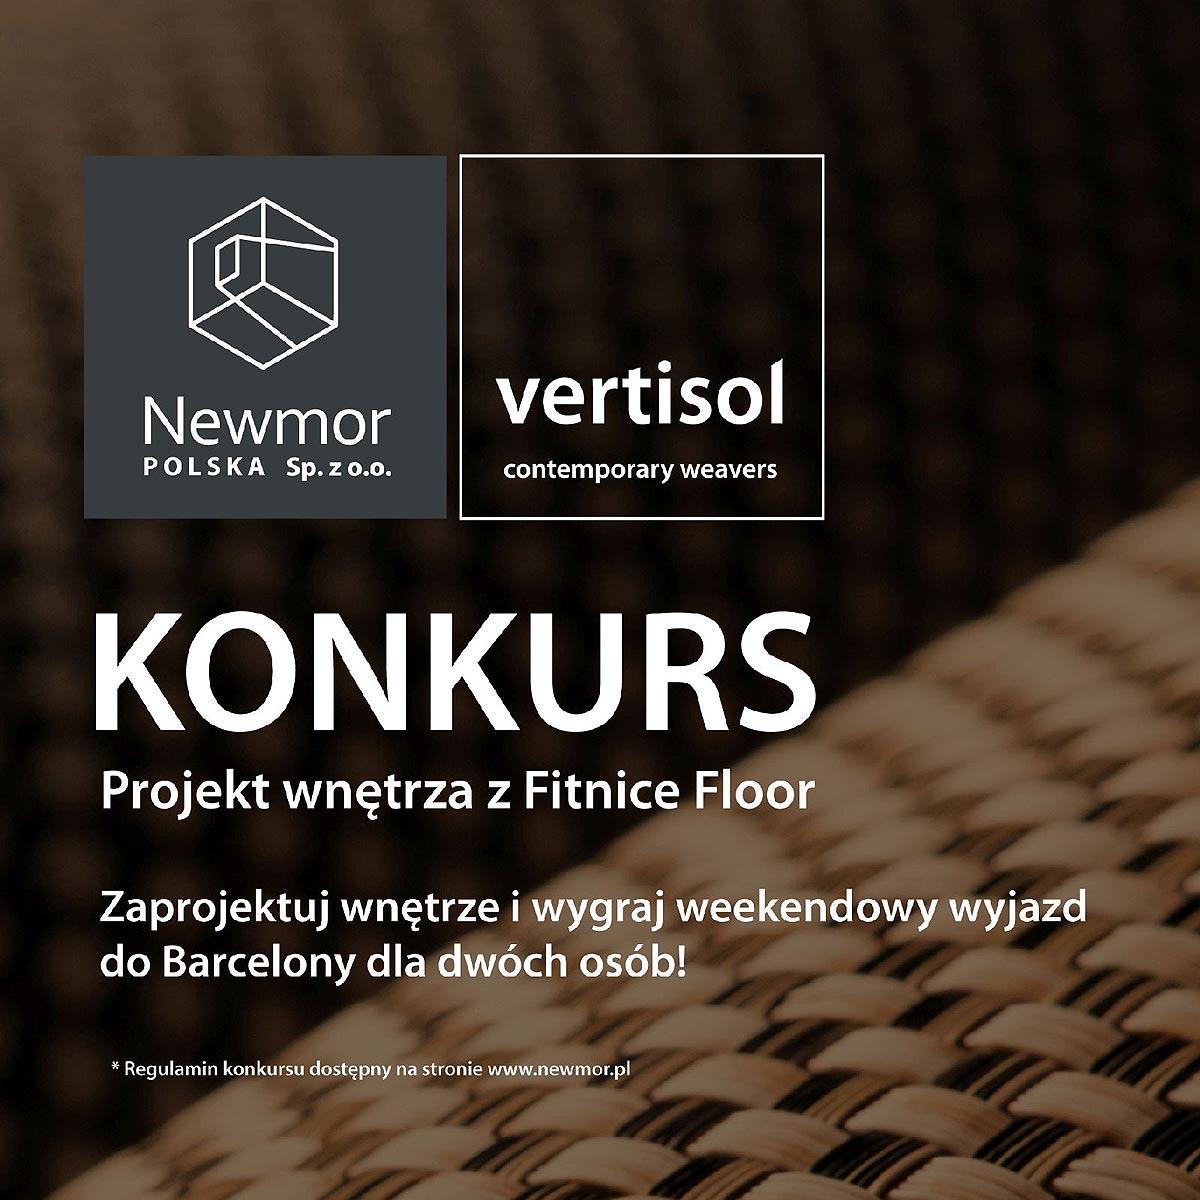 konkurs Projekt Wnętrza z Fitnice Floor